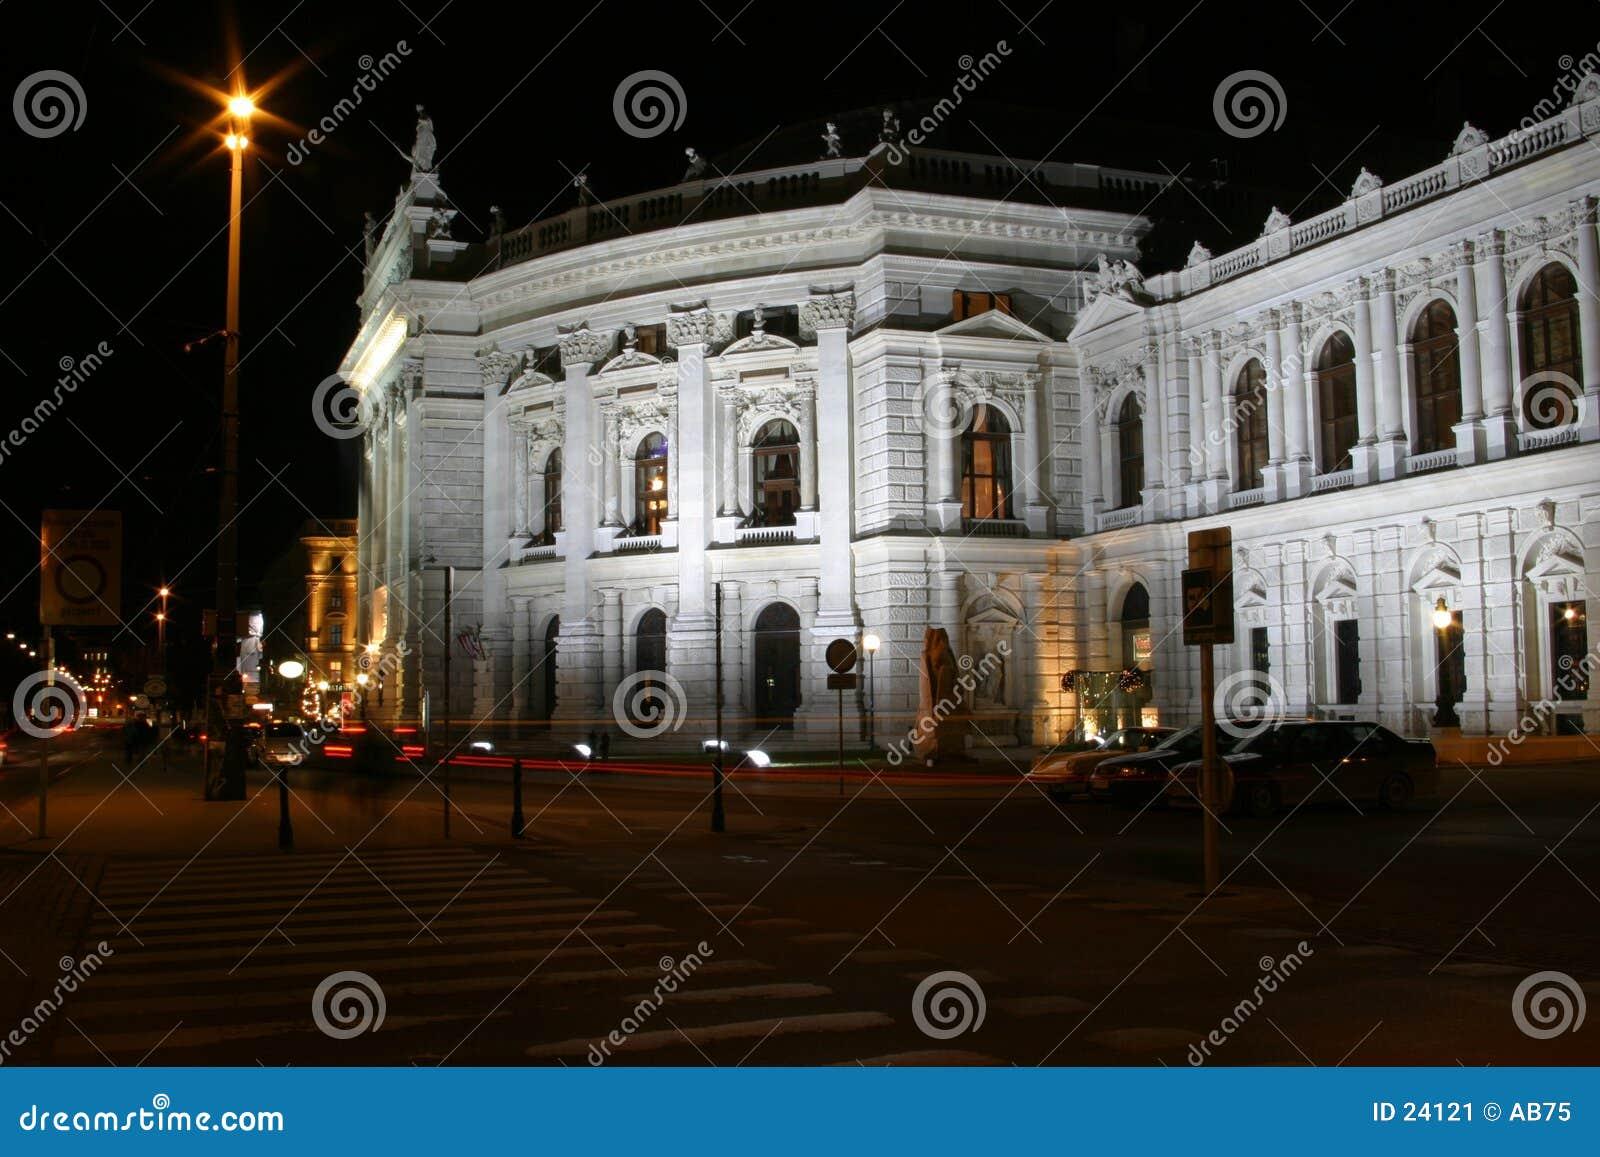 Burgtheater in Vienna, night scenes